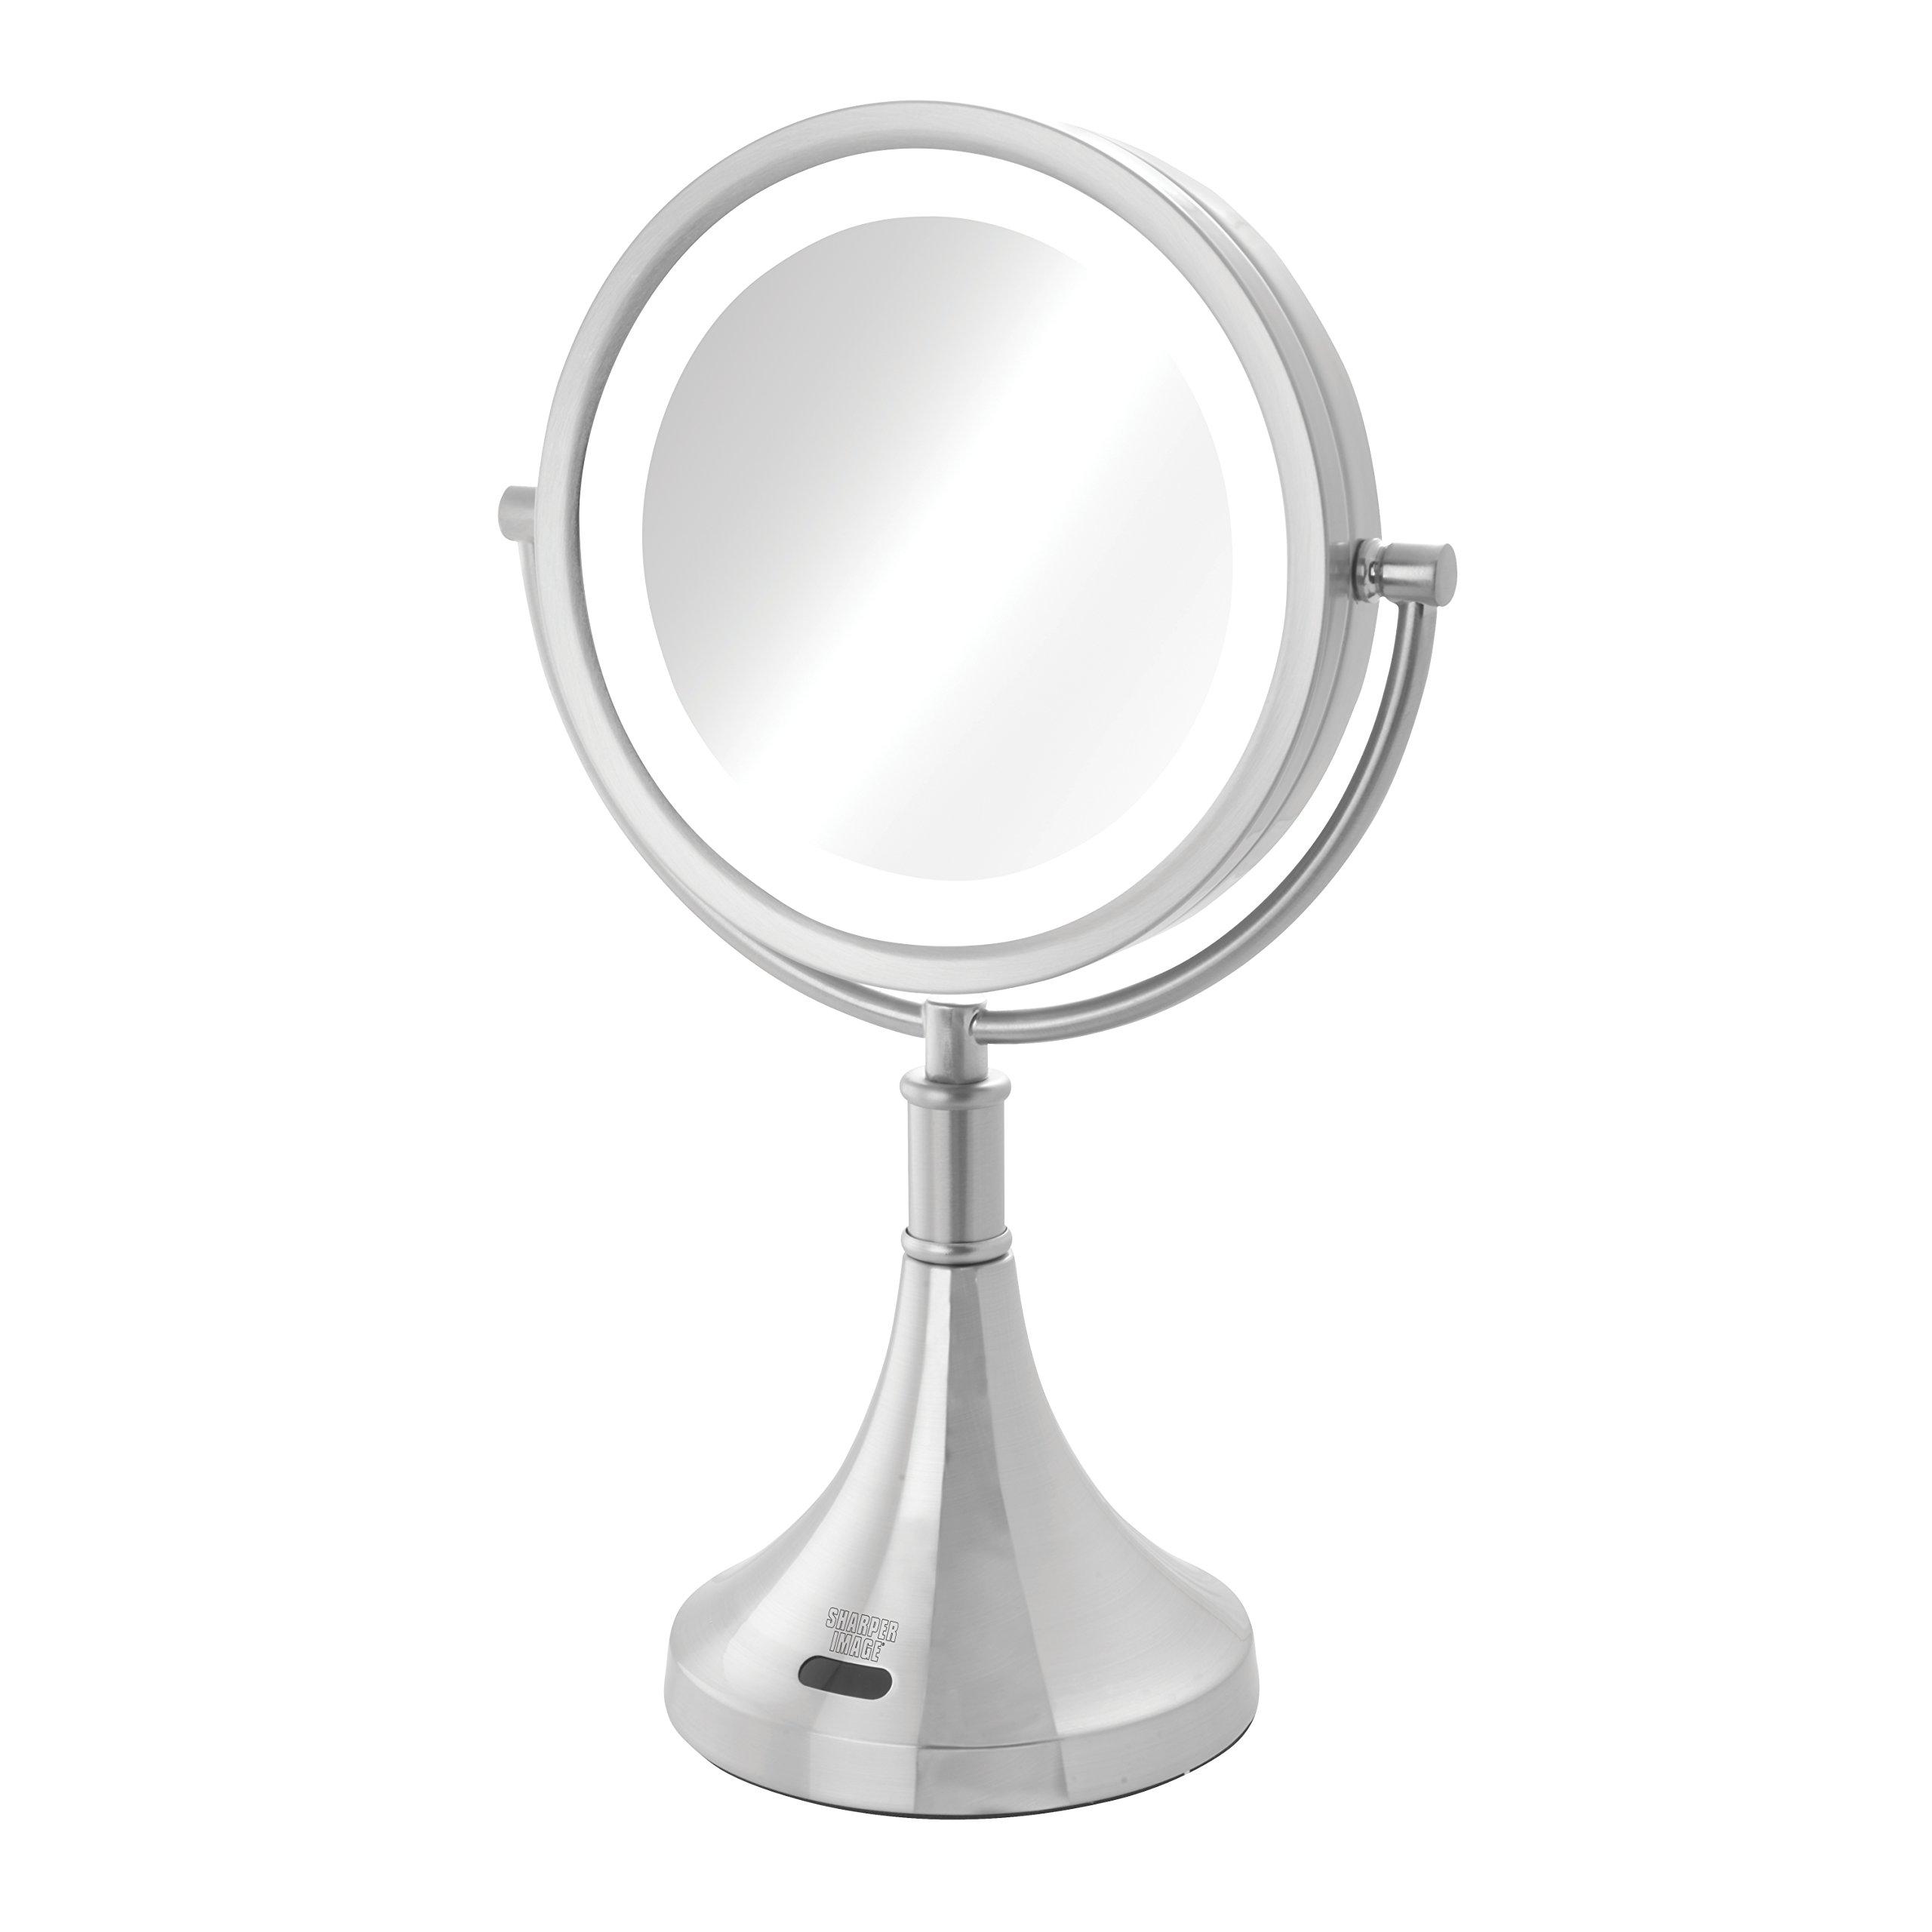 Sharper Image 8X-1X LED Lighted Sensor Mirror, Nickel, 2.95 Pound